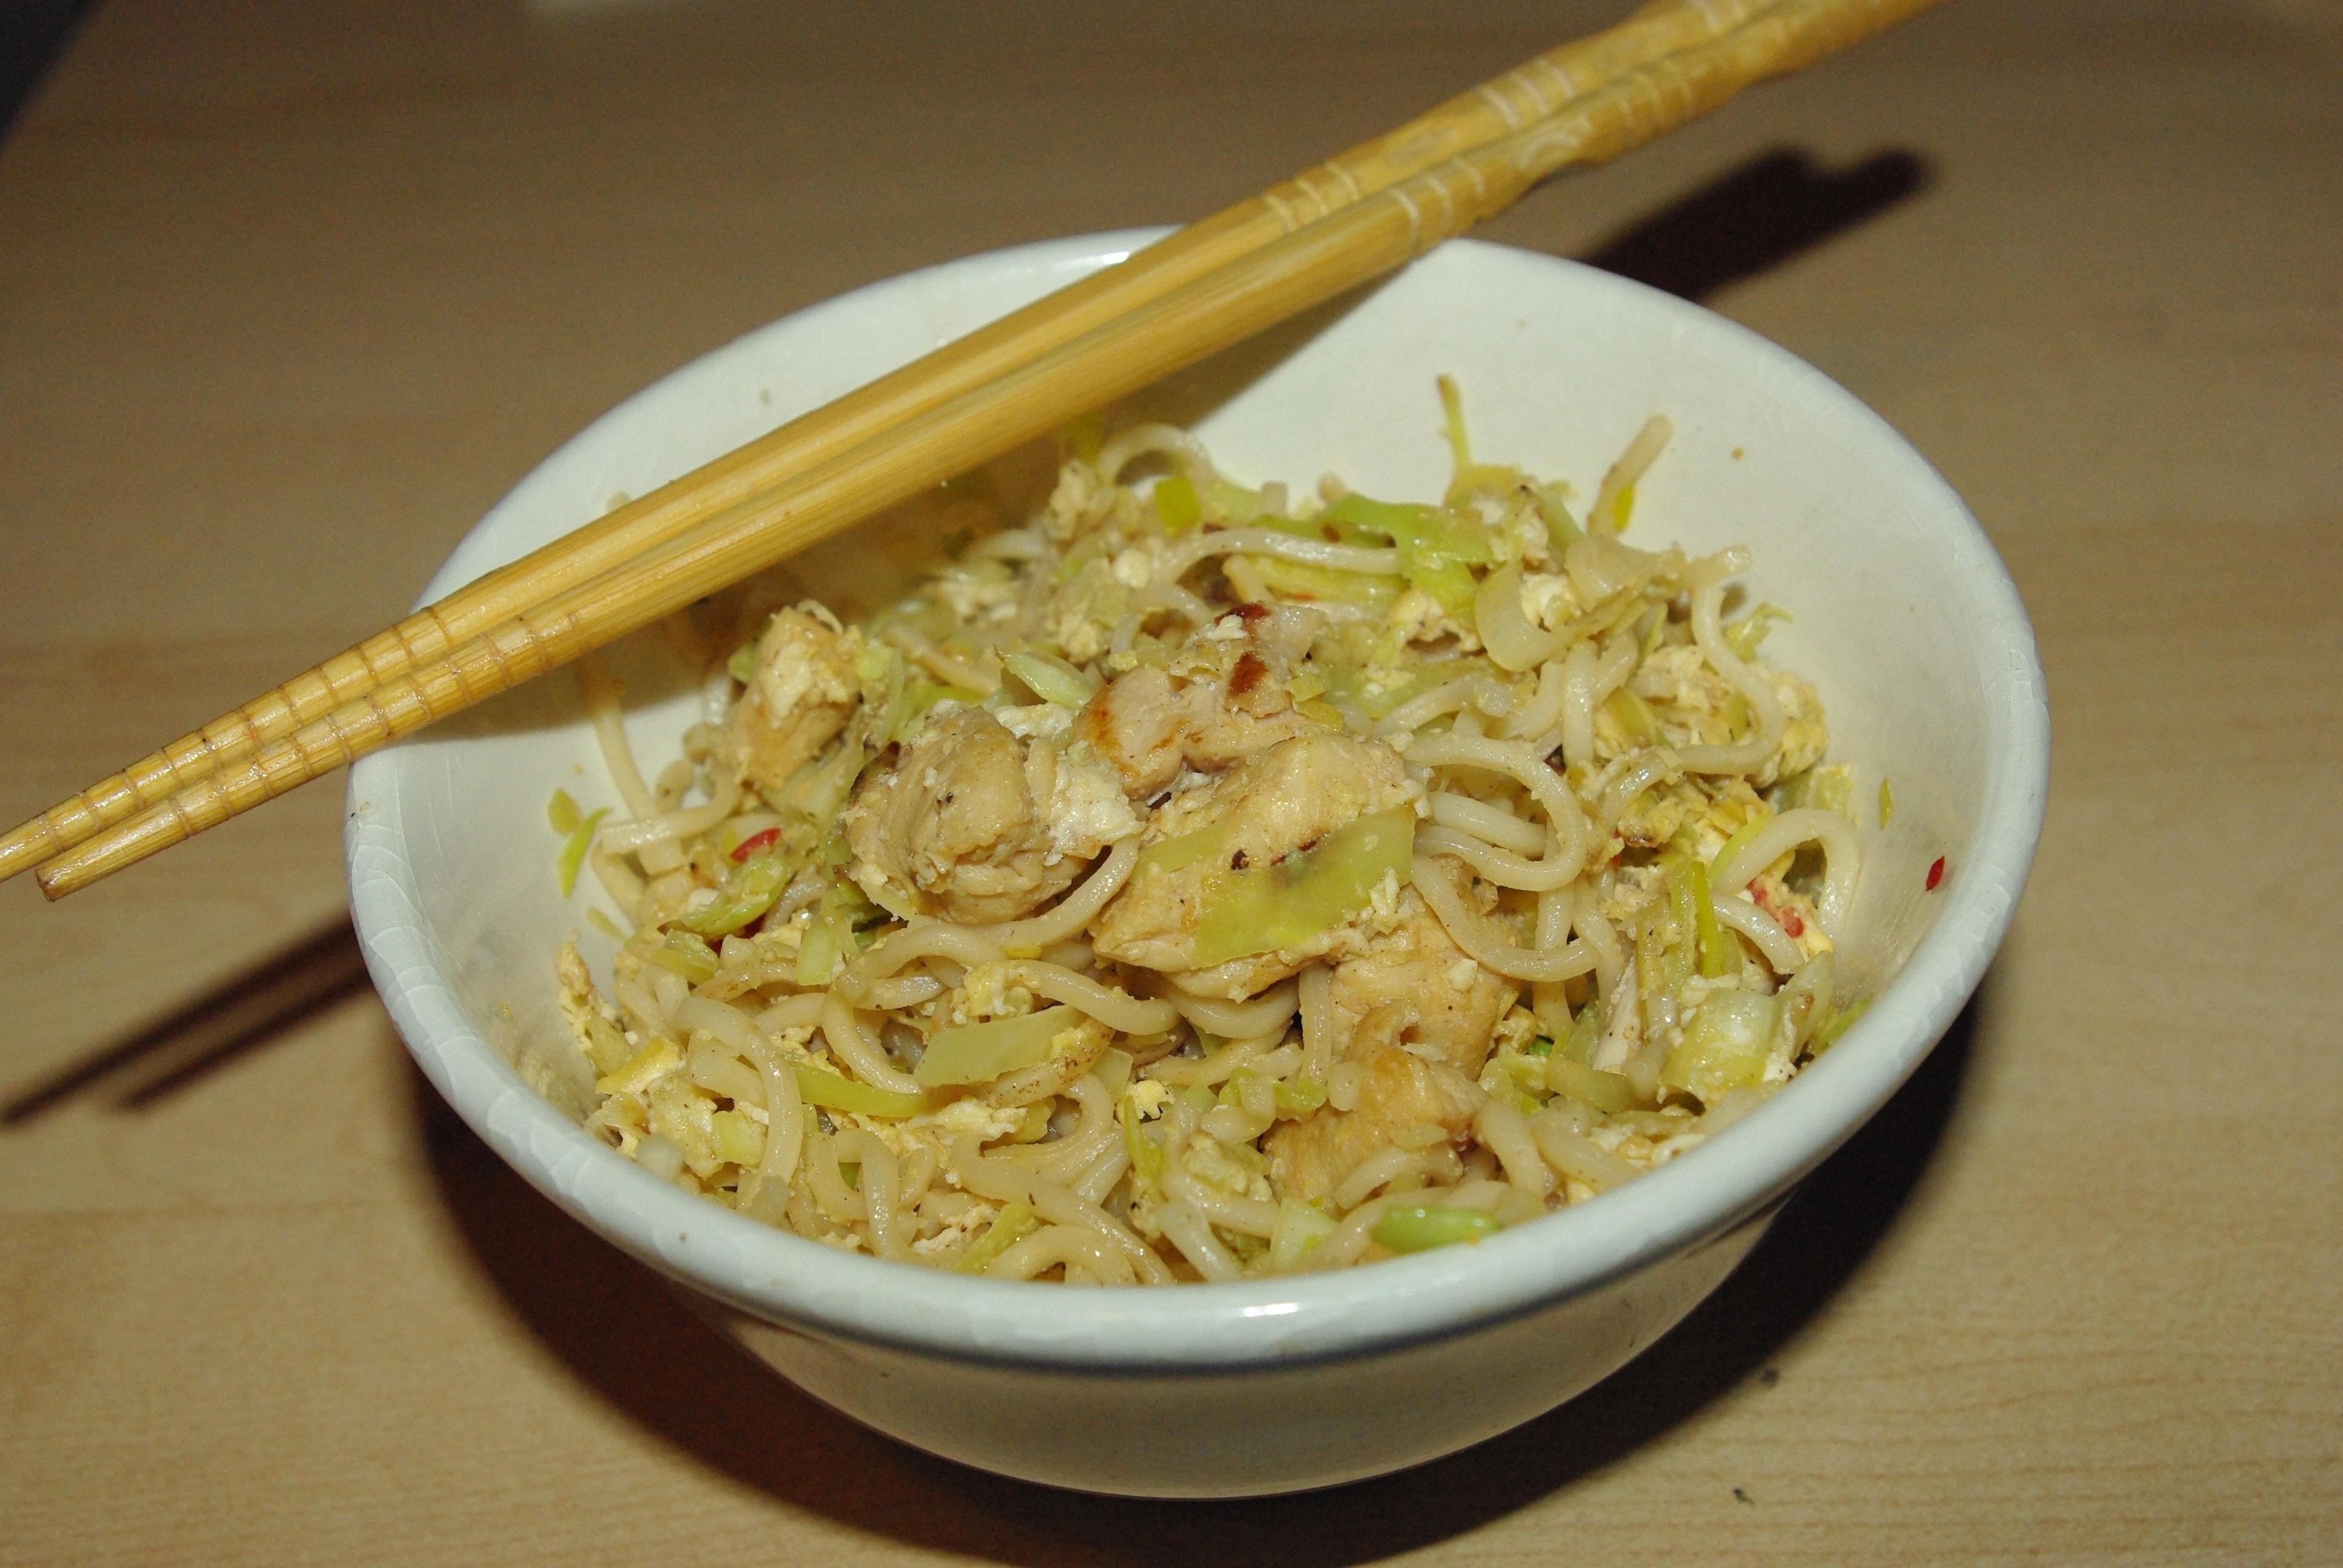 asiatisk mat med sesamolja